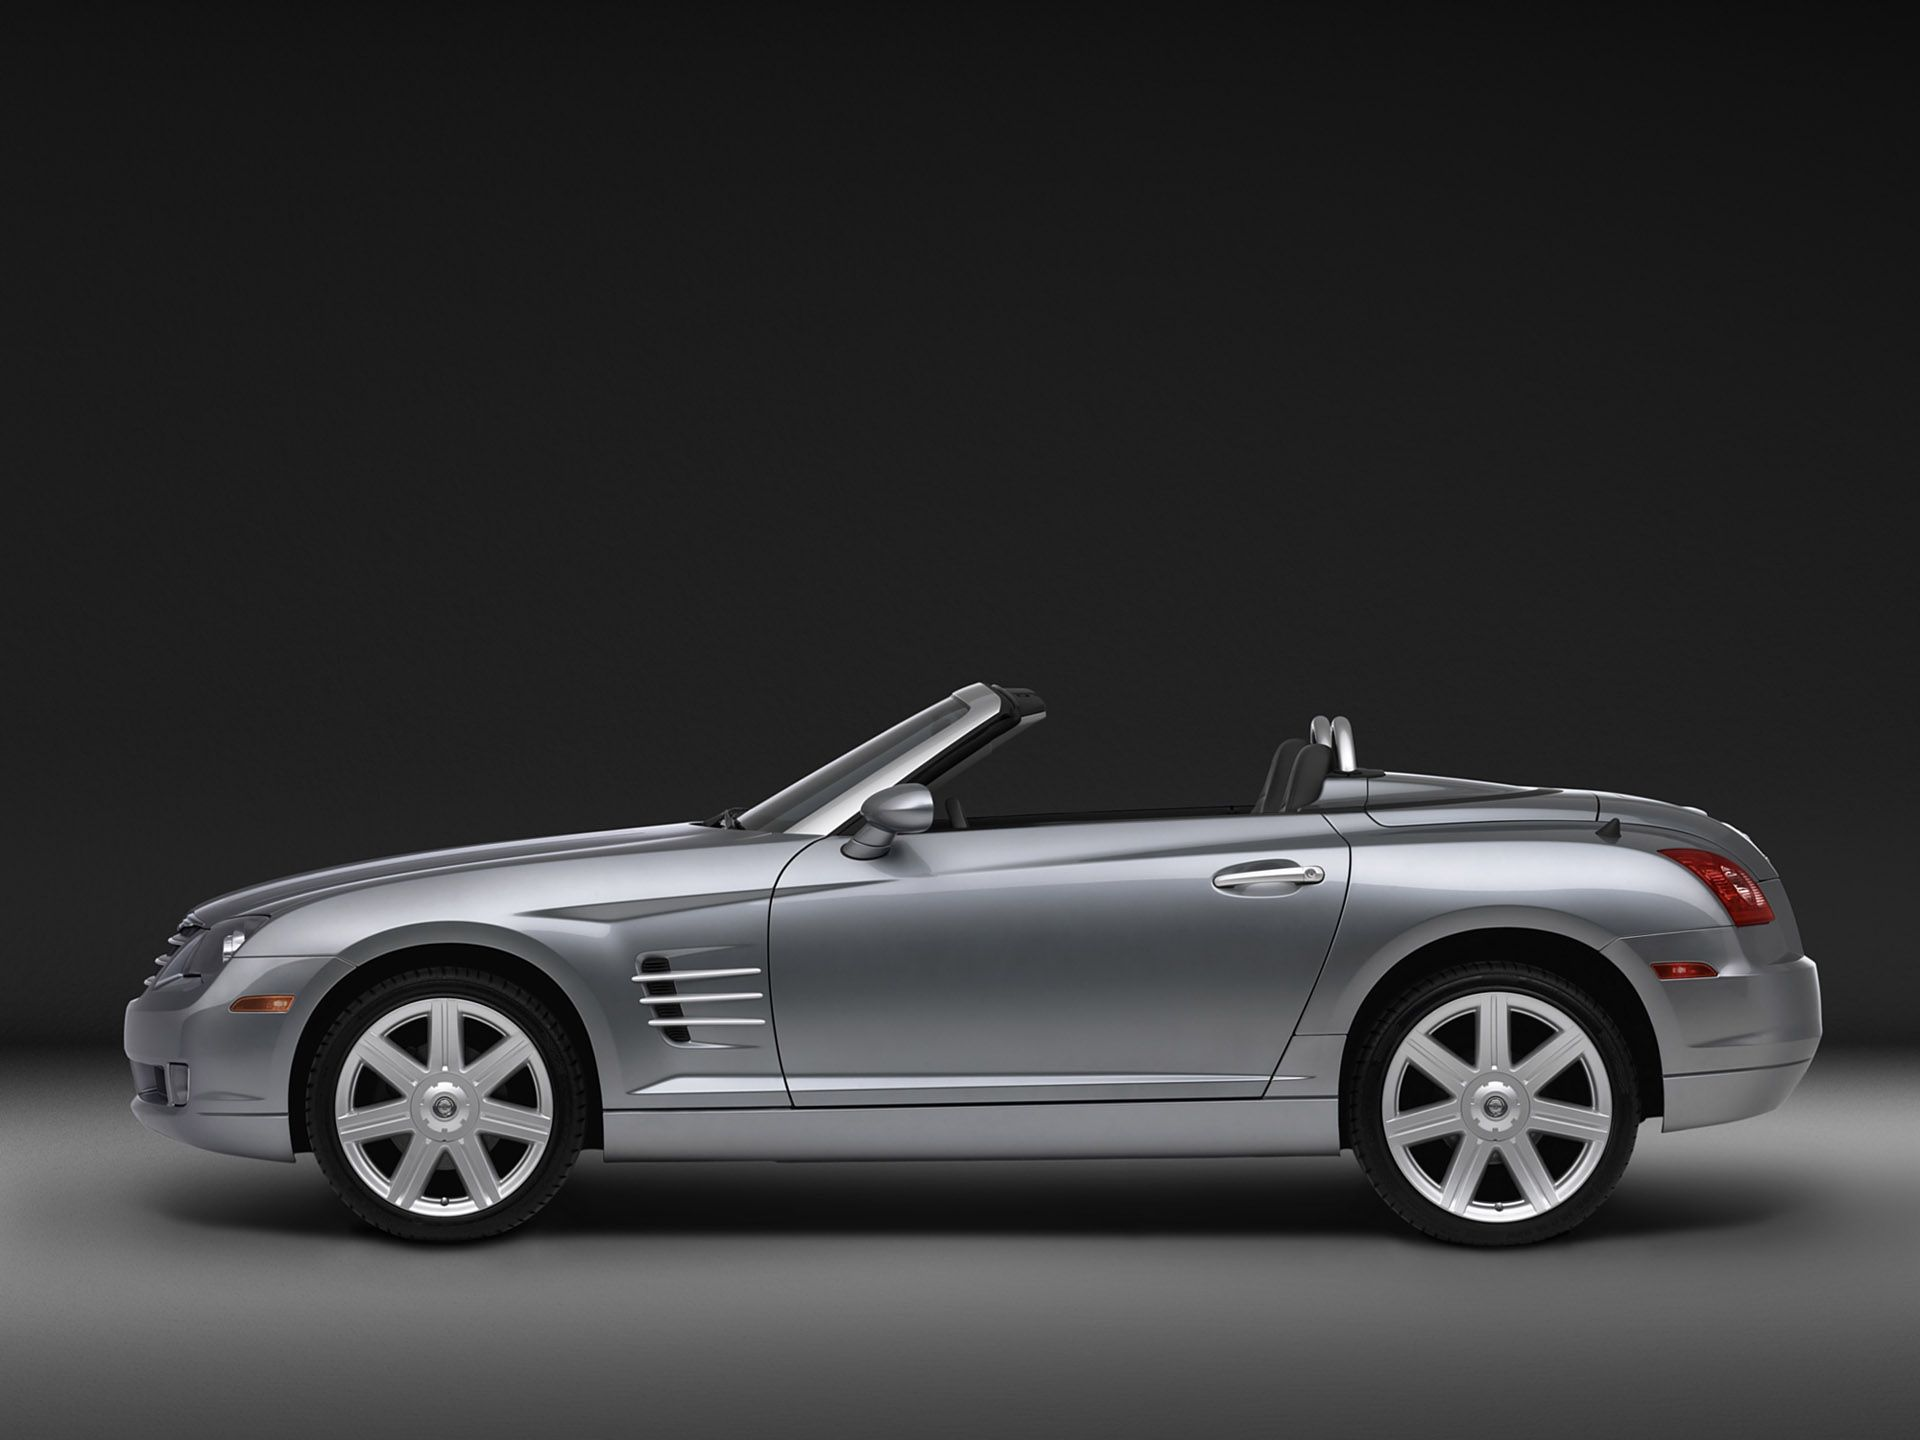 2005 Chrysler Crossfire Roadster Side Silver Studio